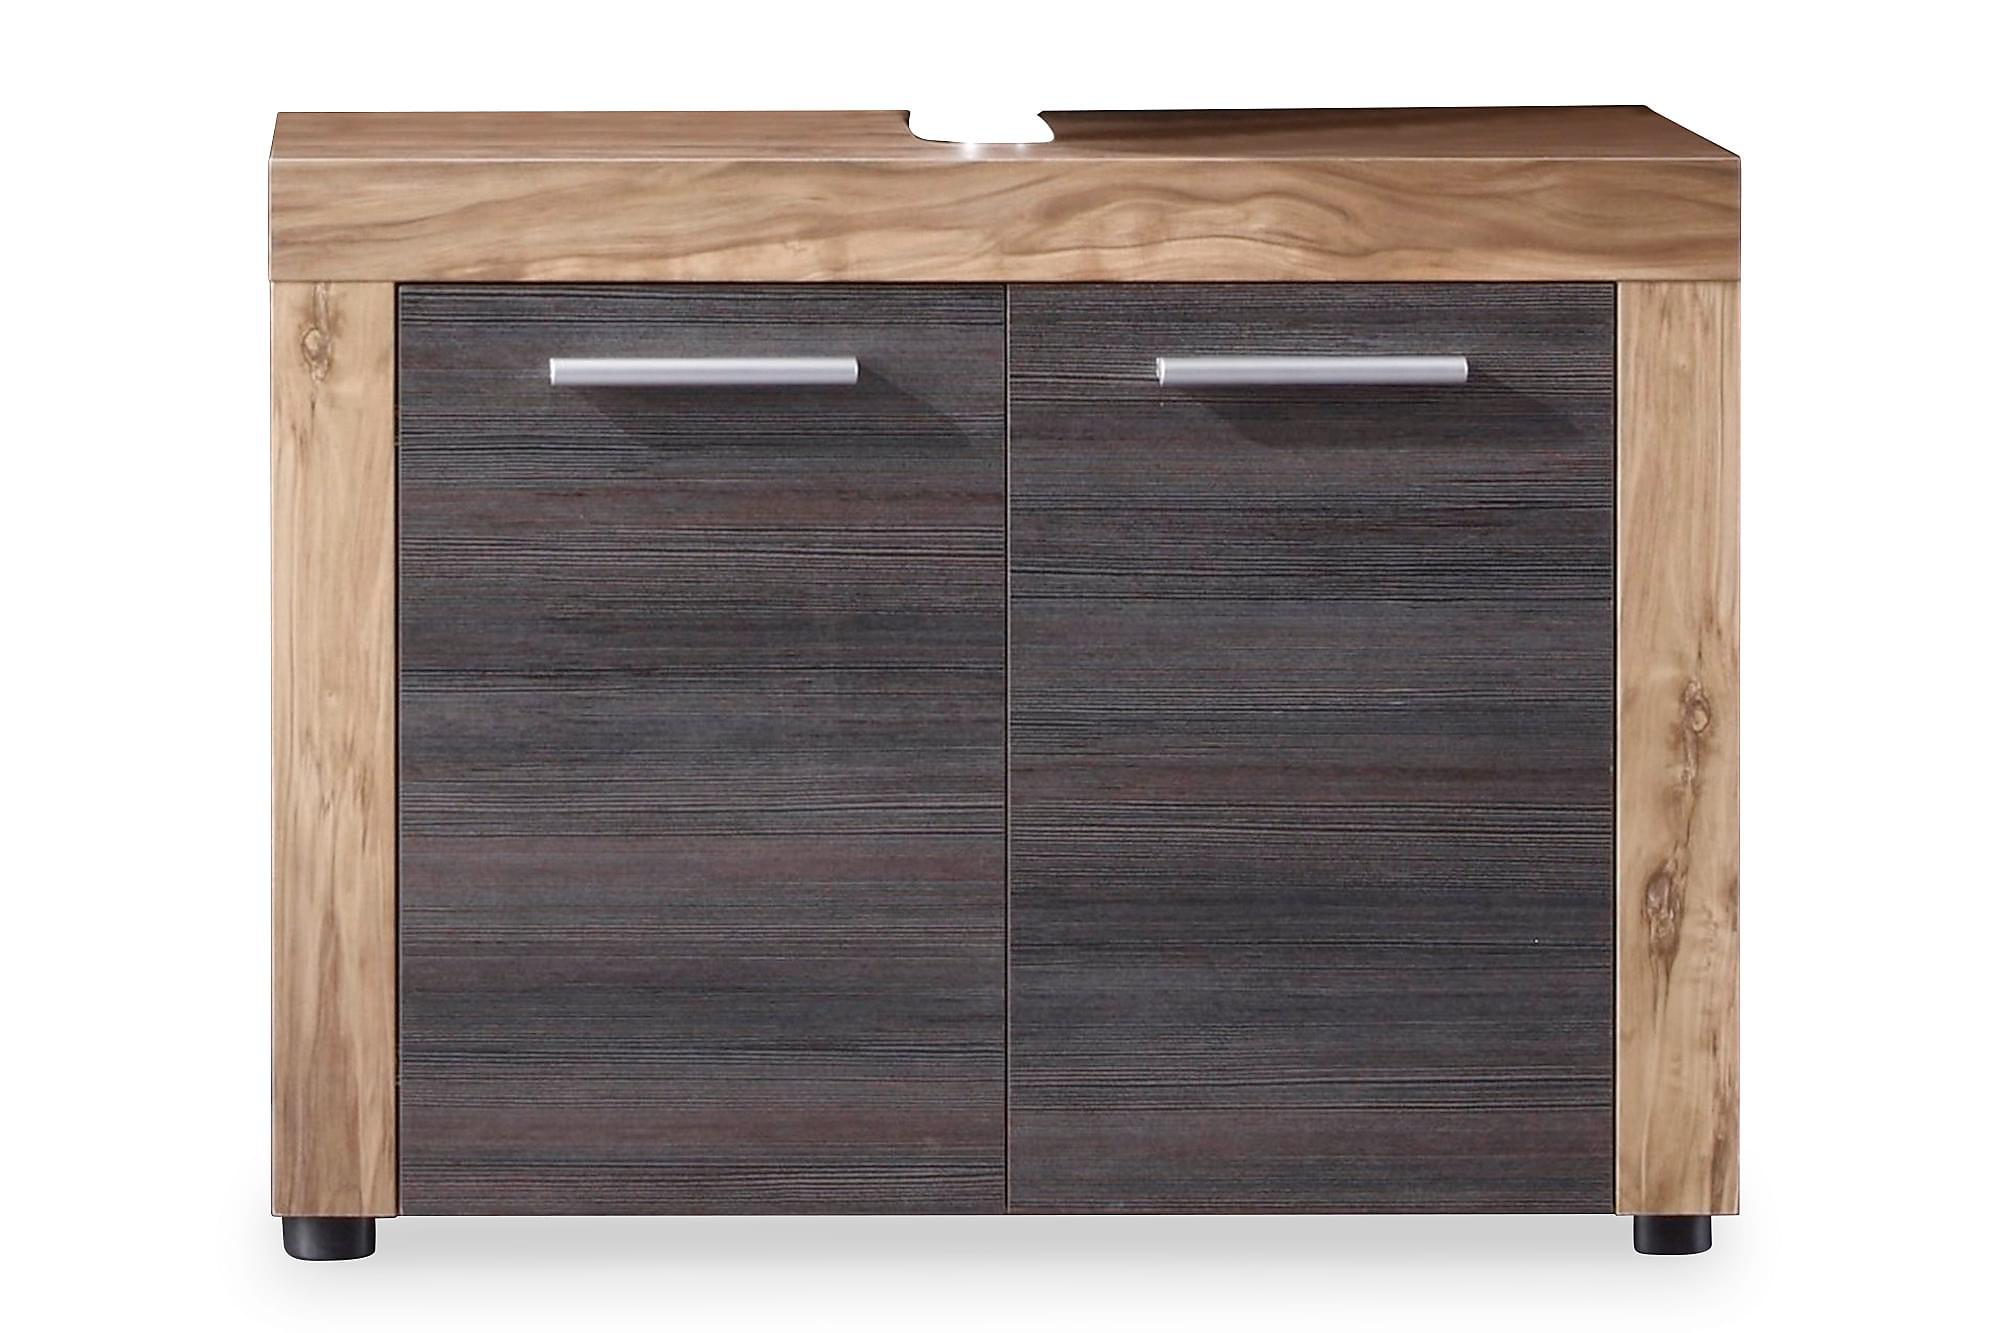 Cornell Möbelset XL 4 Delar Valnöt/Touchwood, Badrumsförvaring